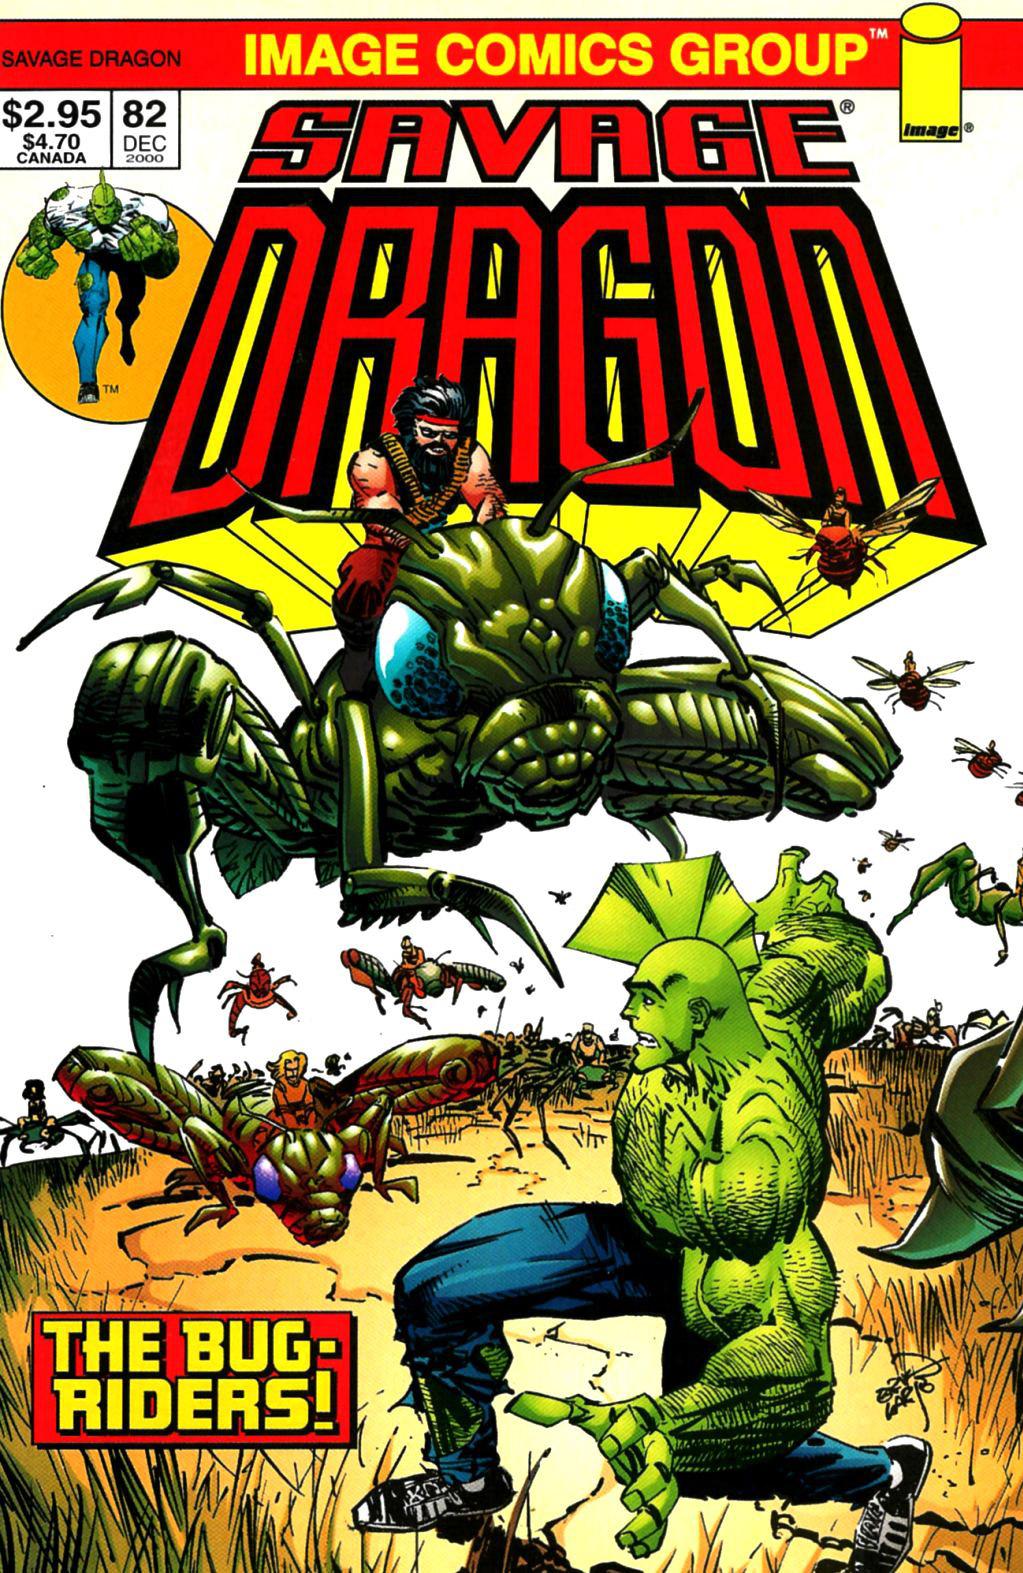 Cover Savage Dragon Vol.2 #82